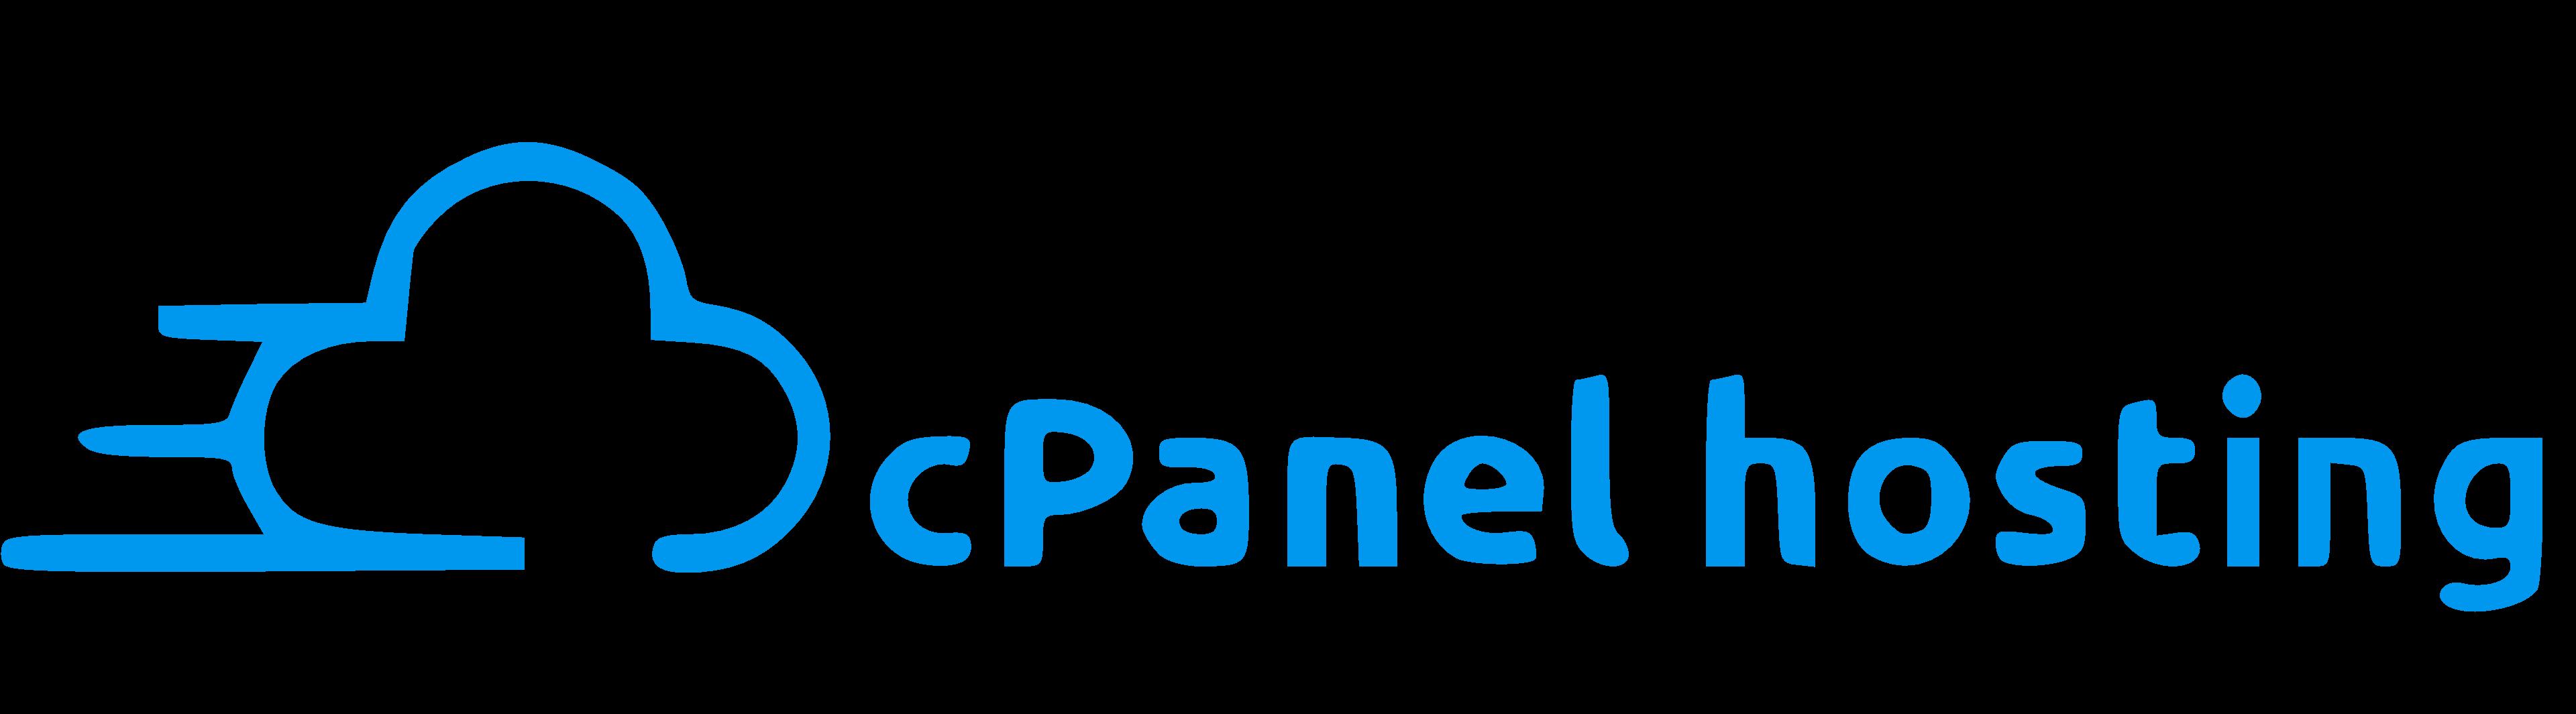 cPanelhosting UPDATE: 2020-12-27 - новый ISP Billmanager 6